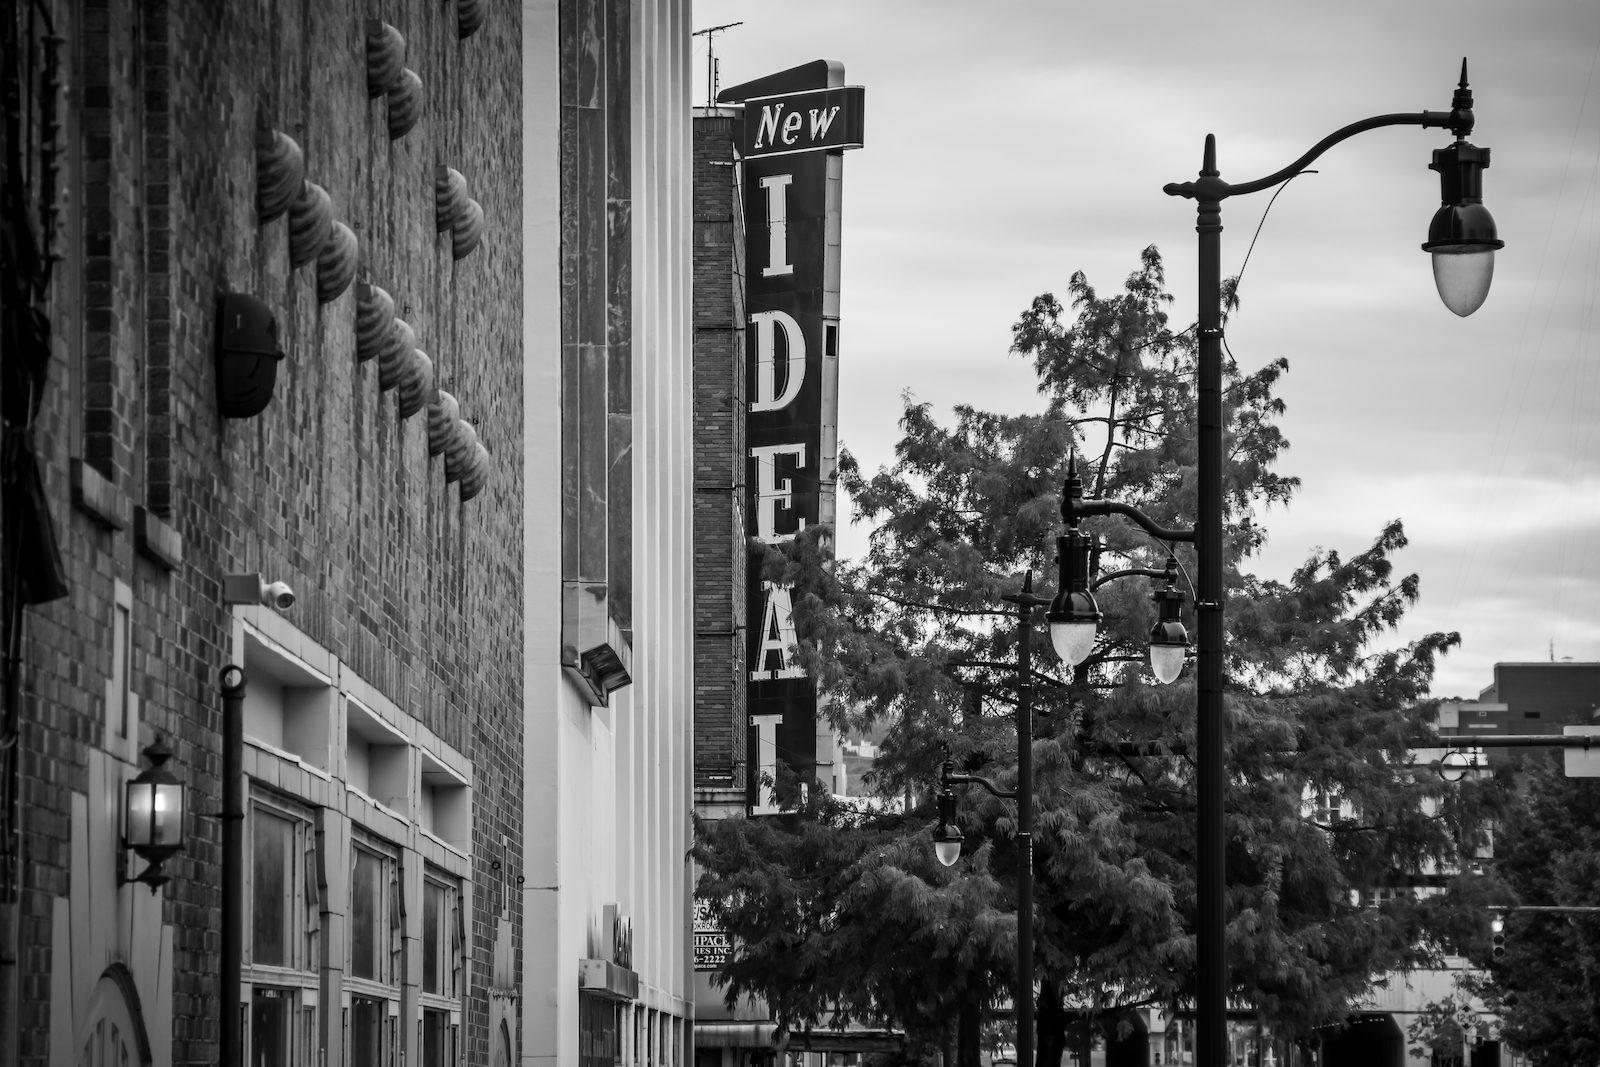 """New Ideal"" sign on 18th St N in Birmingham, AL"